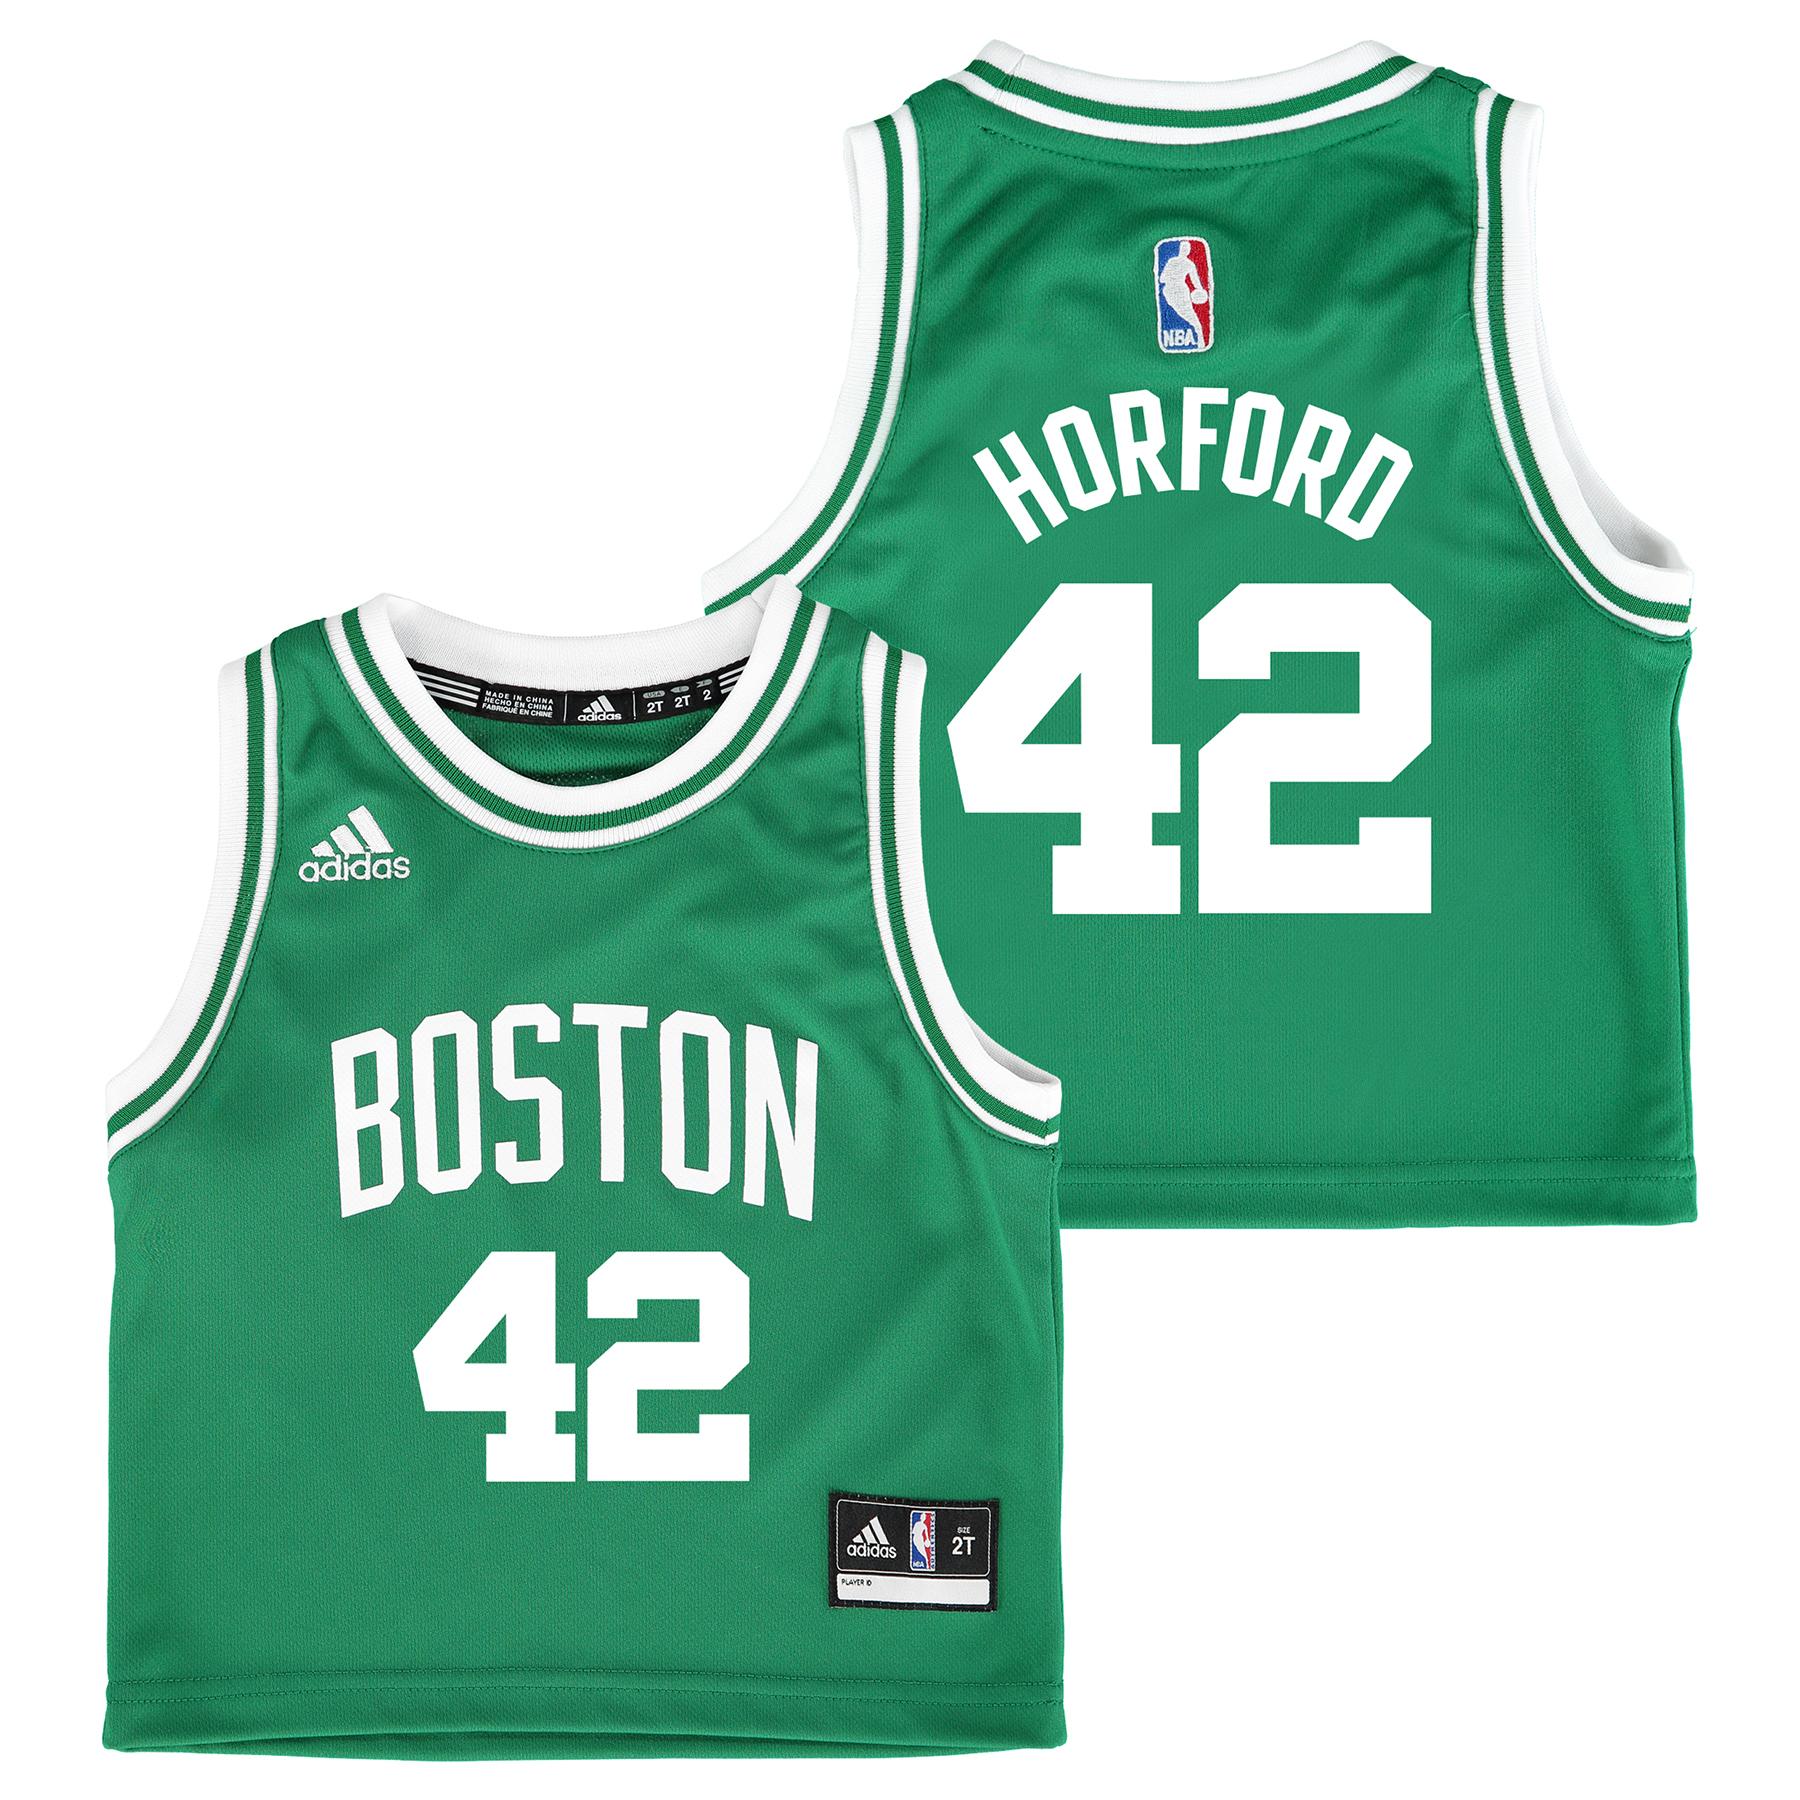 Boston Celtics Road Replica Jersey - Al Horford - Toddler